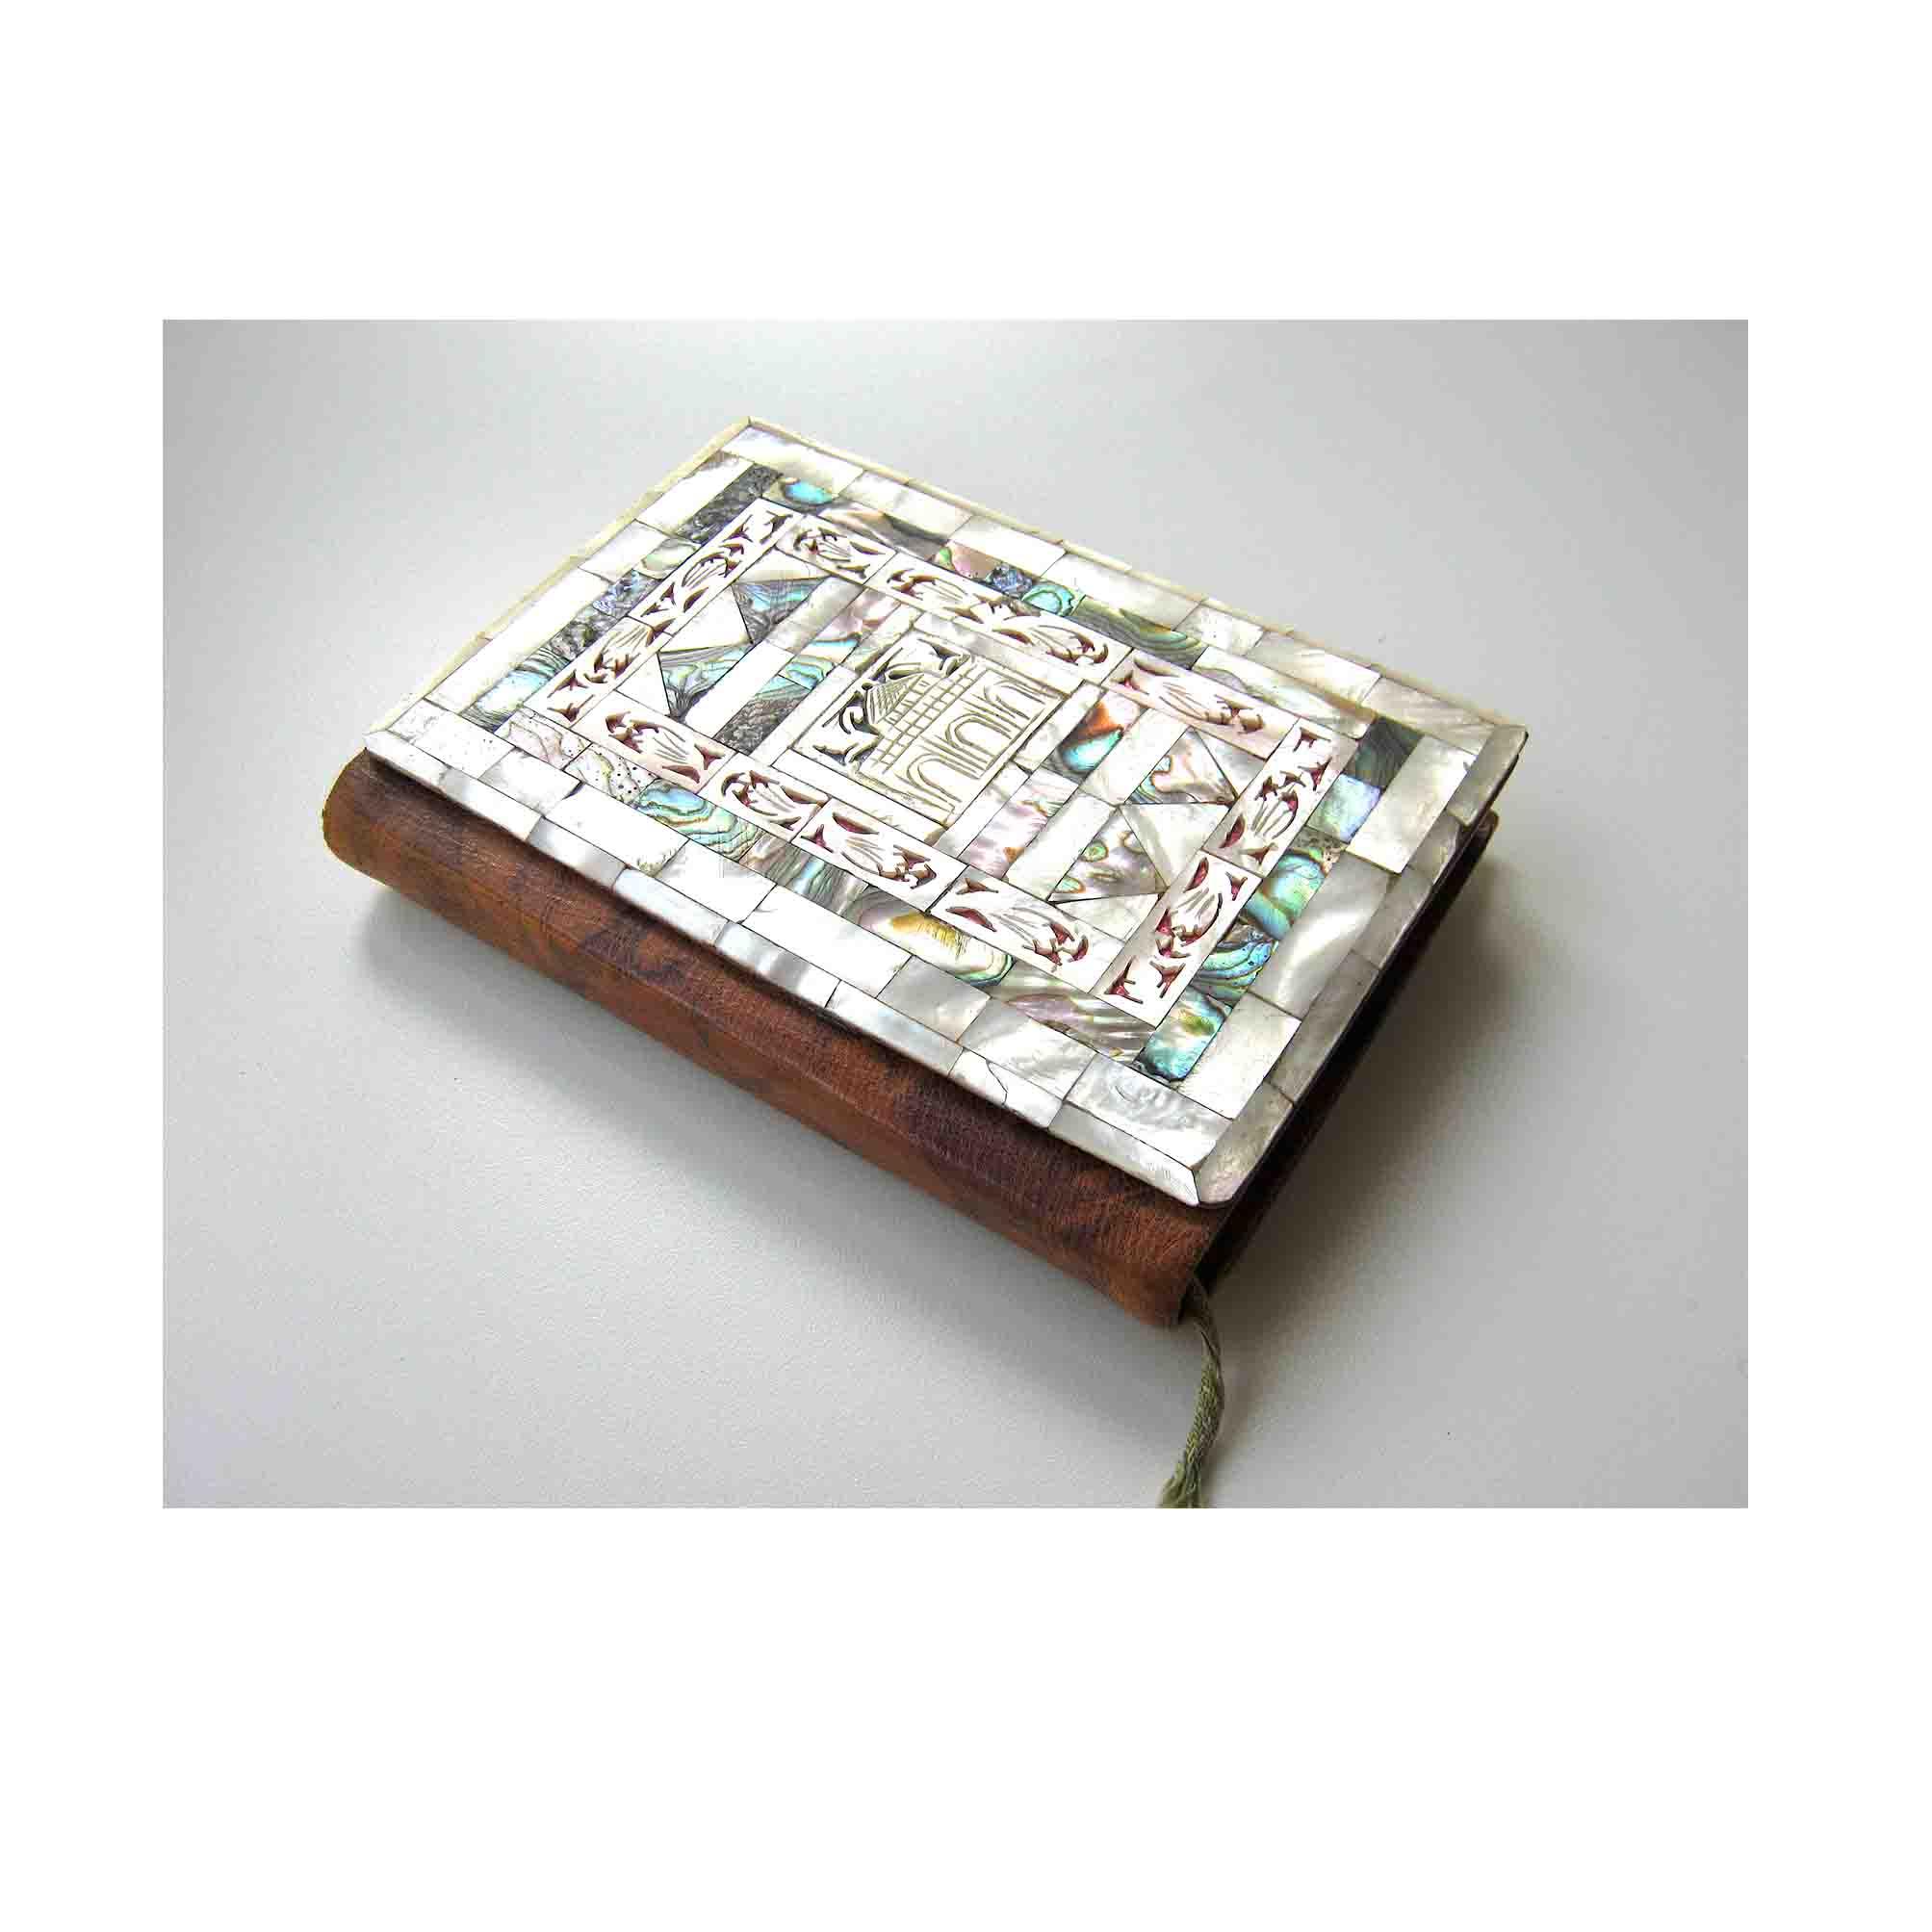 5675-Quran-Binding-Mother-Of-Pearls-1925-1945-Cover-recto-N.jpg